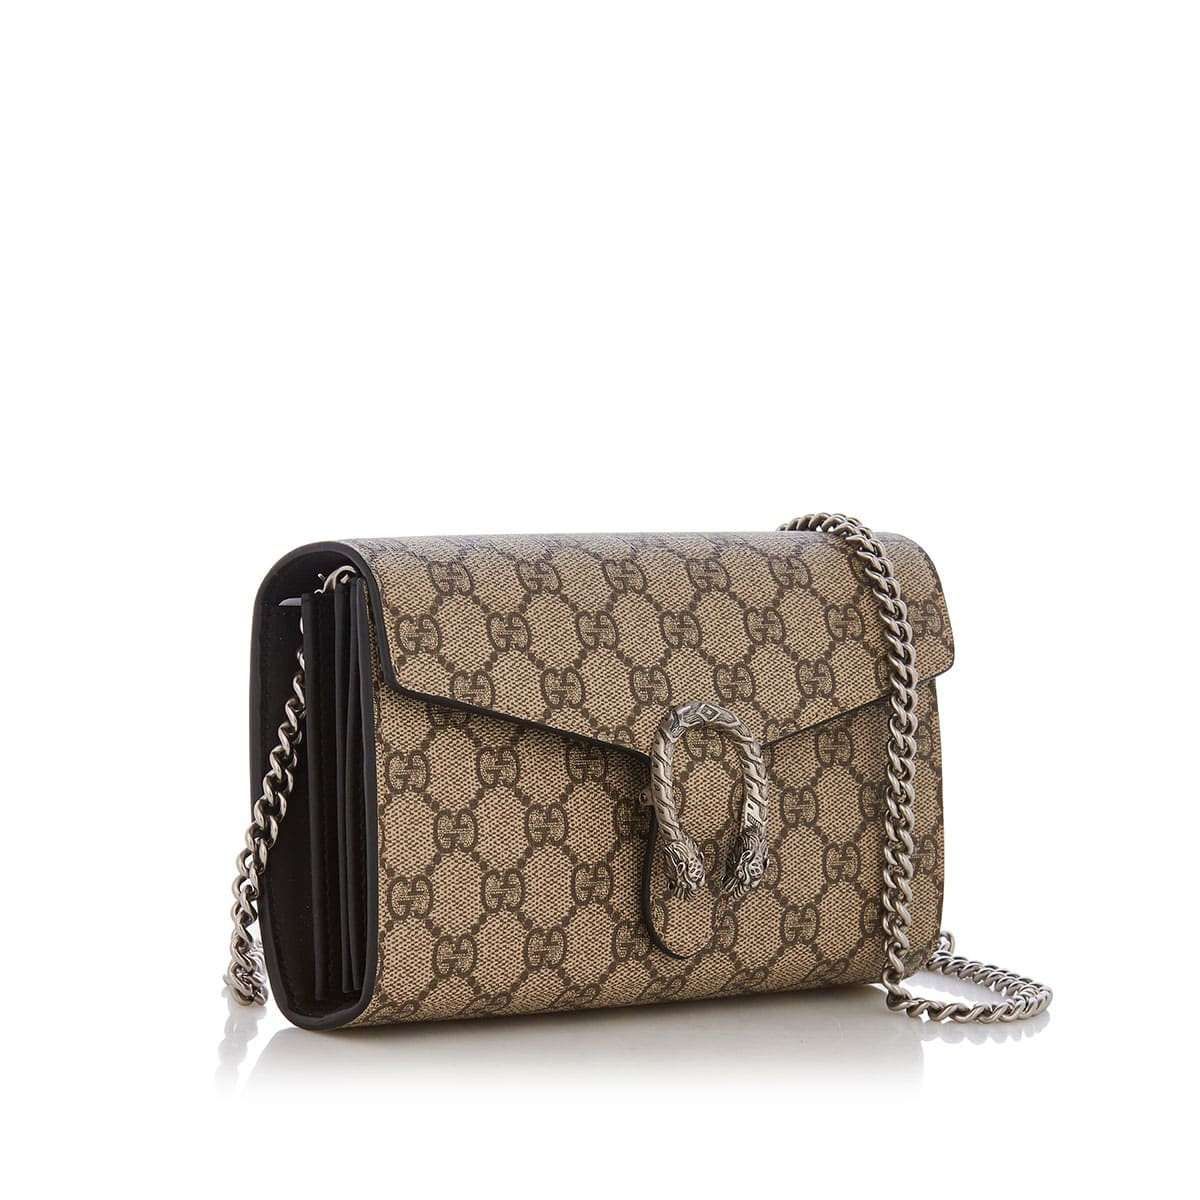 Dionysus GG Supreme chain wallet